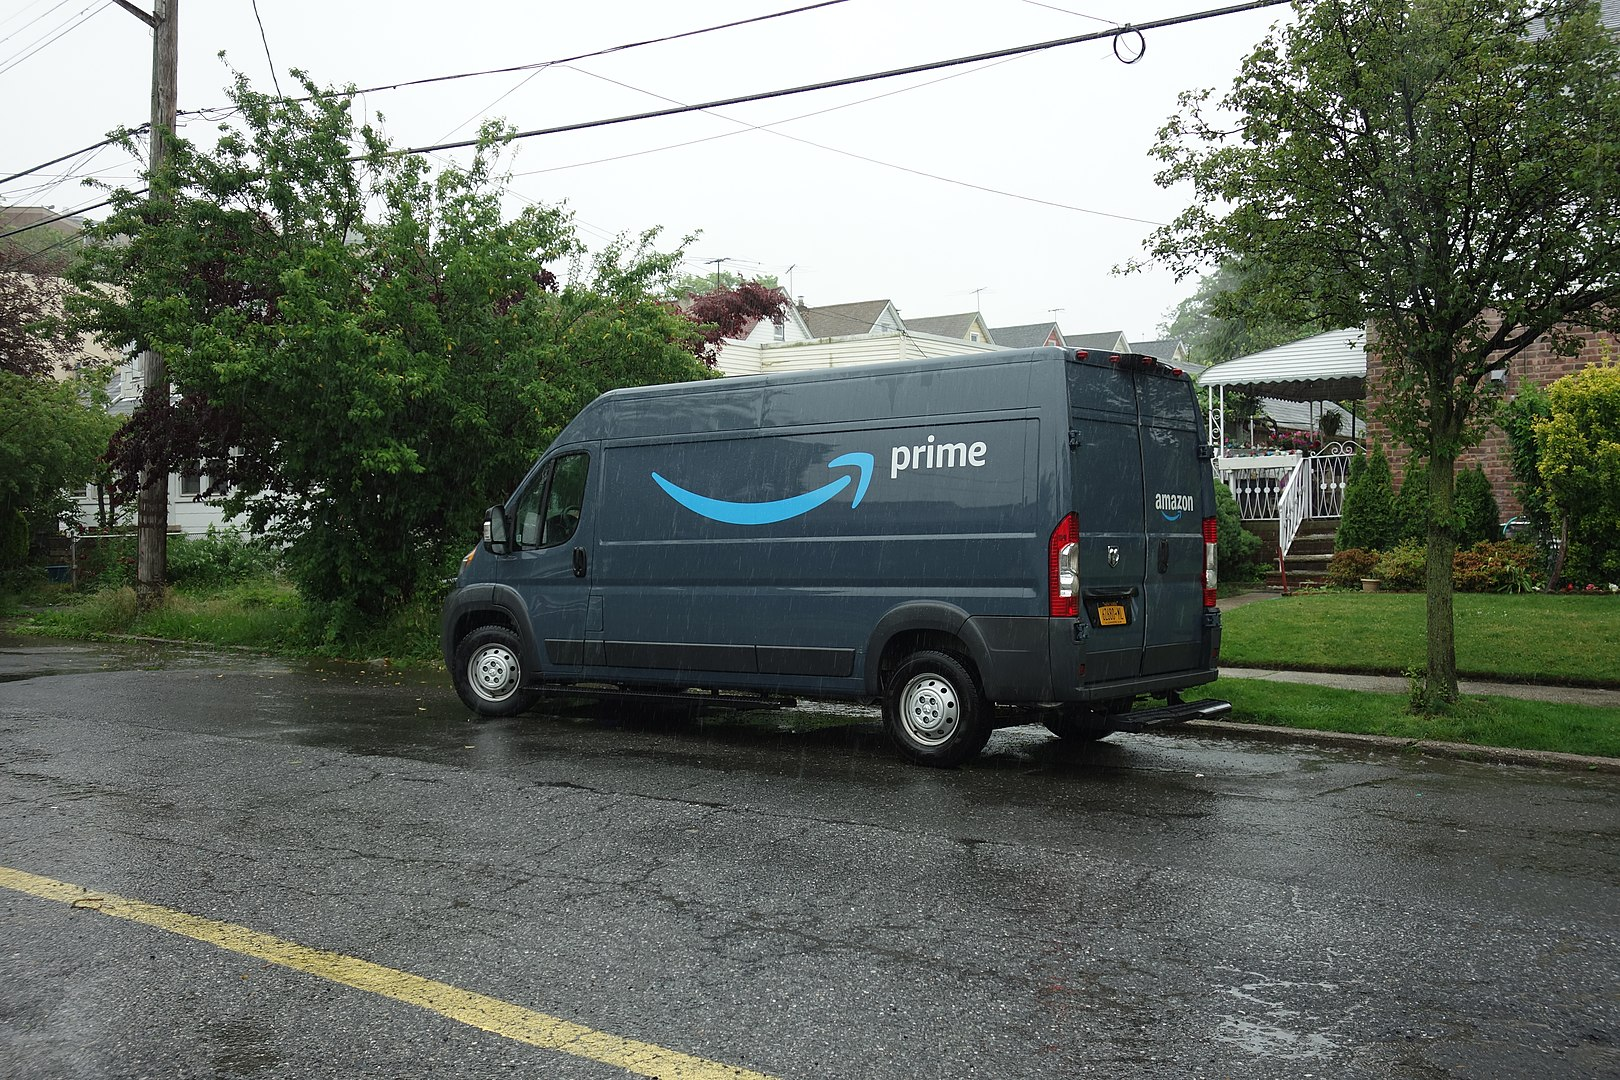 Amazon van